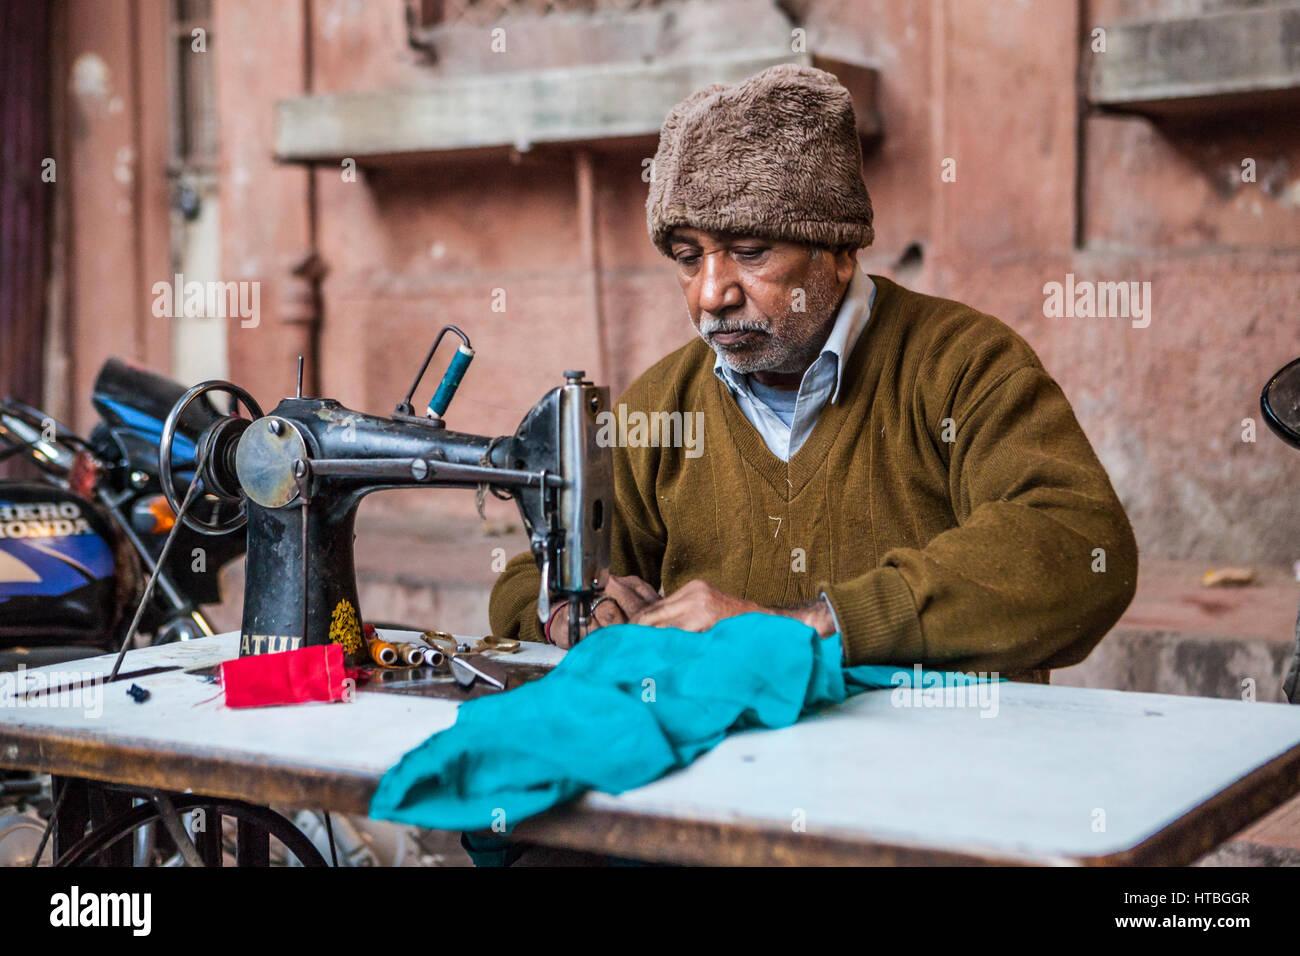 A man working at a sewing machine in Sadar Market in Jodhpur, Rajasthan, India. - Stock Image